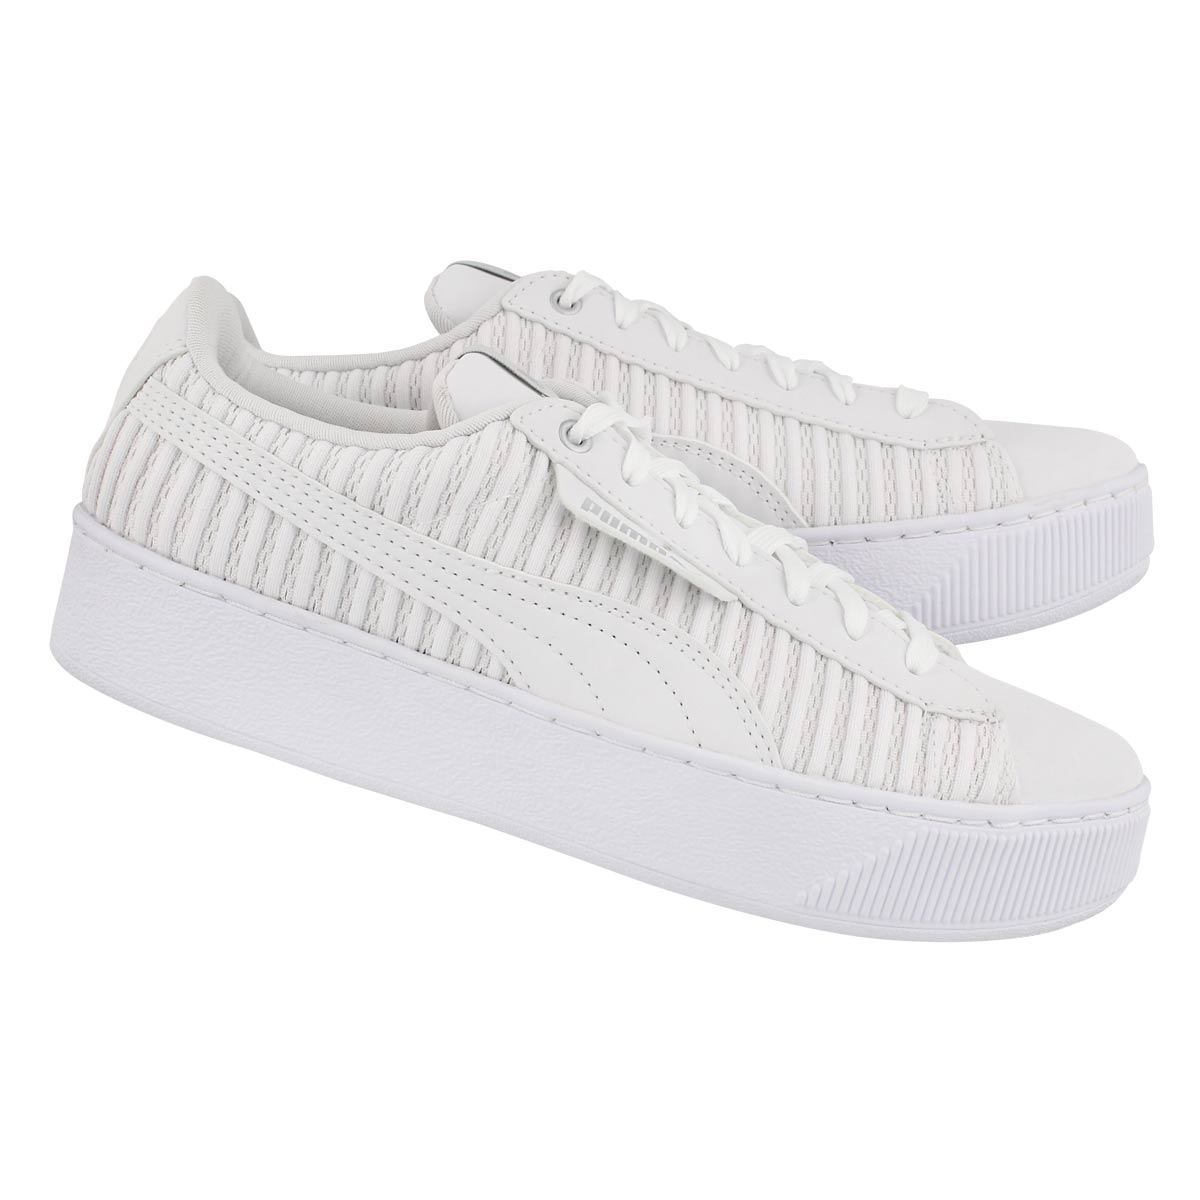 code promo 2396d 3c932 Women's PUMA VIKKY PLATFORM wht/wht sneakers